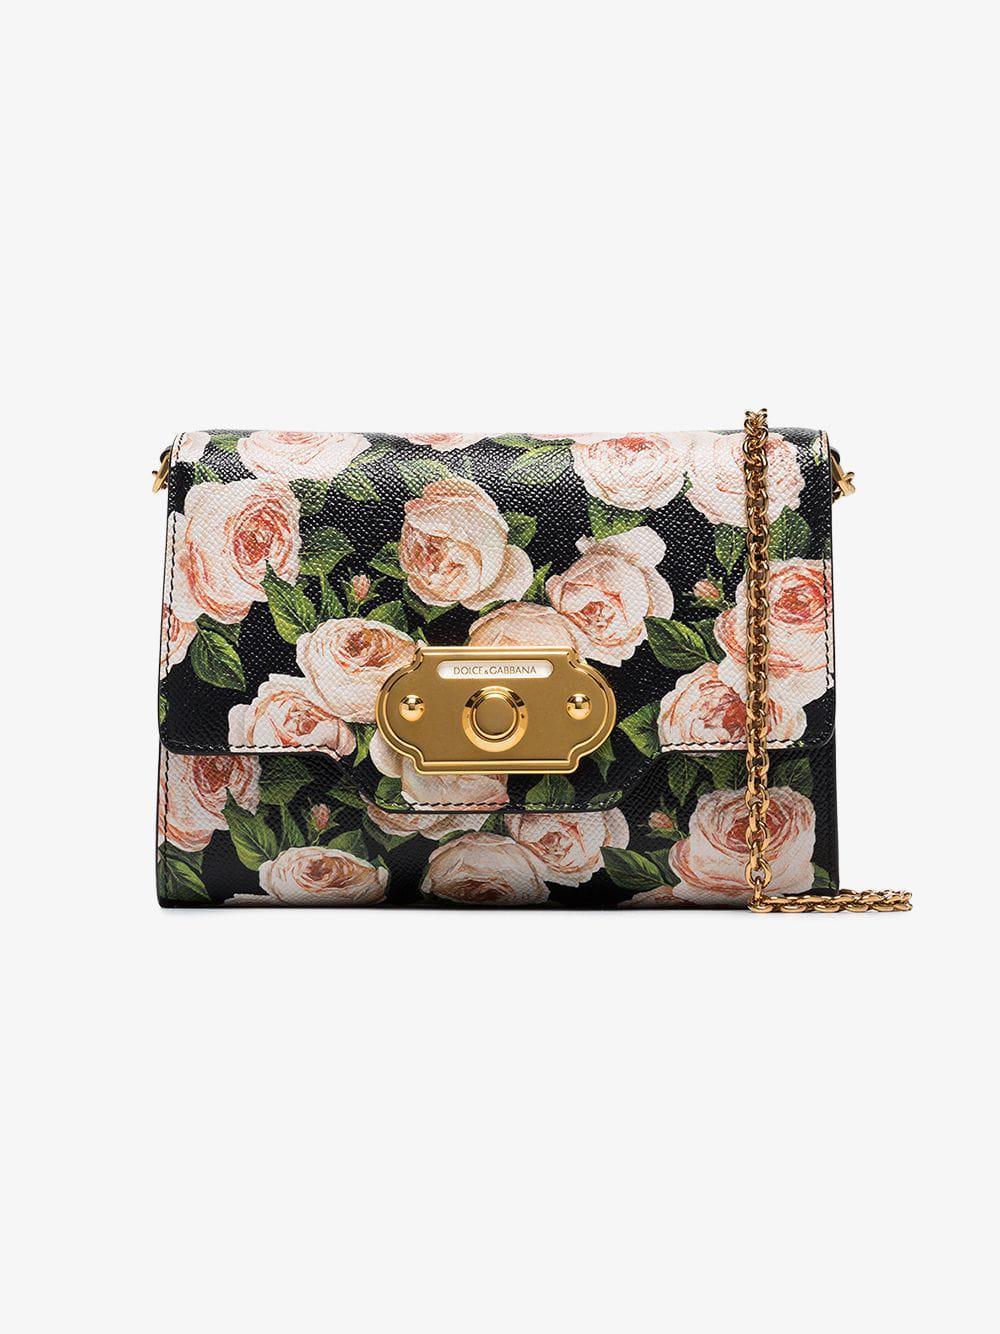 Dolce   Gabbana - Multicolor Multicoloured Roses Vintage Clasp Mini Bag -  Lyst. View fullscreen 2154ca64debdb